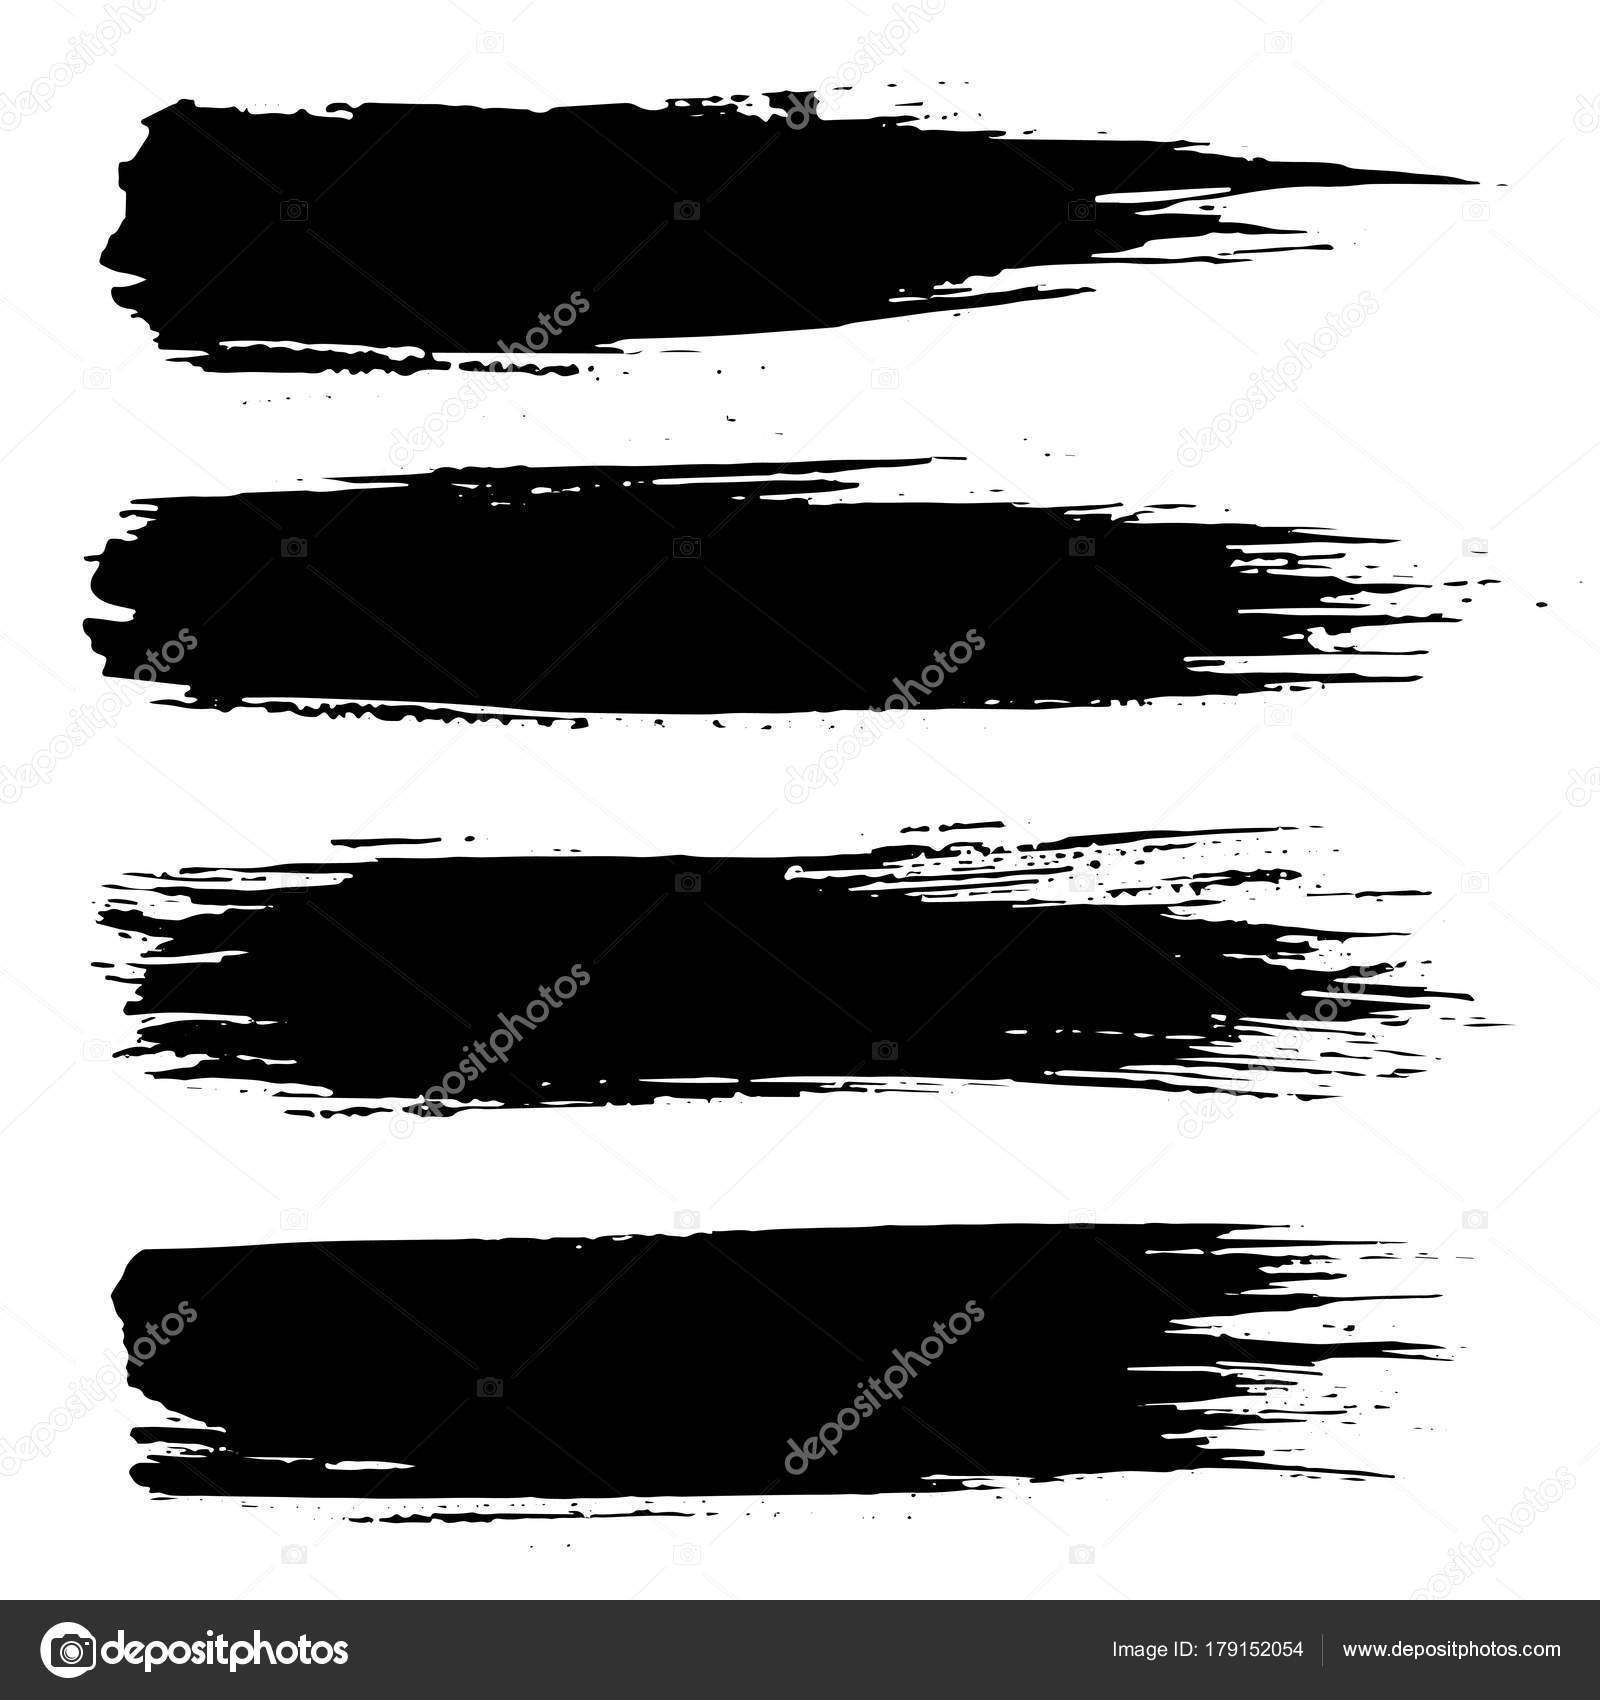 grunge ink brush strokes freehand black brushes handdrawn dry